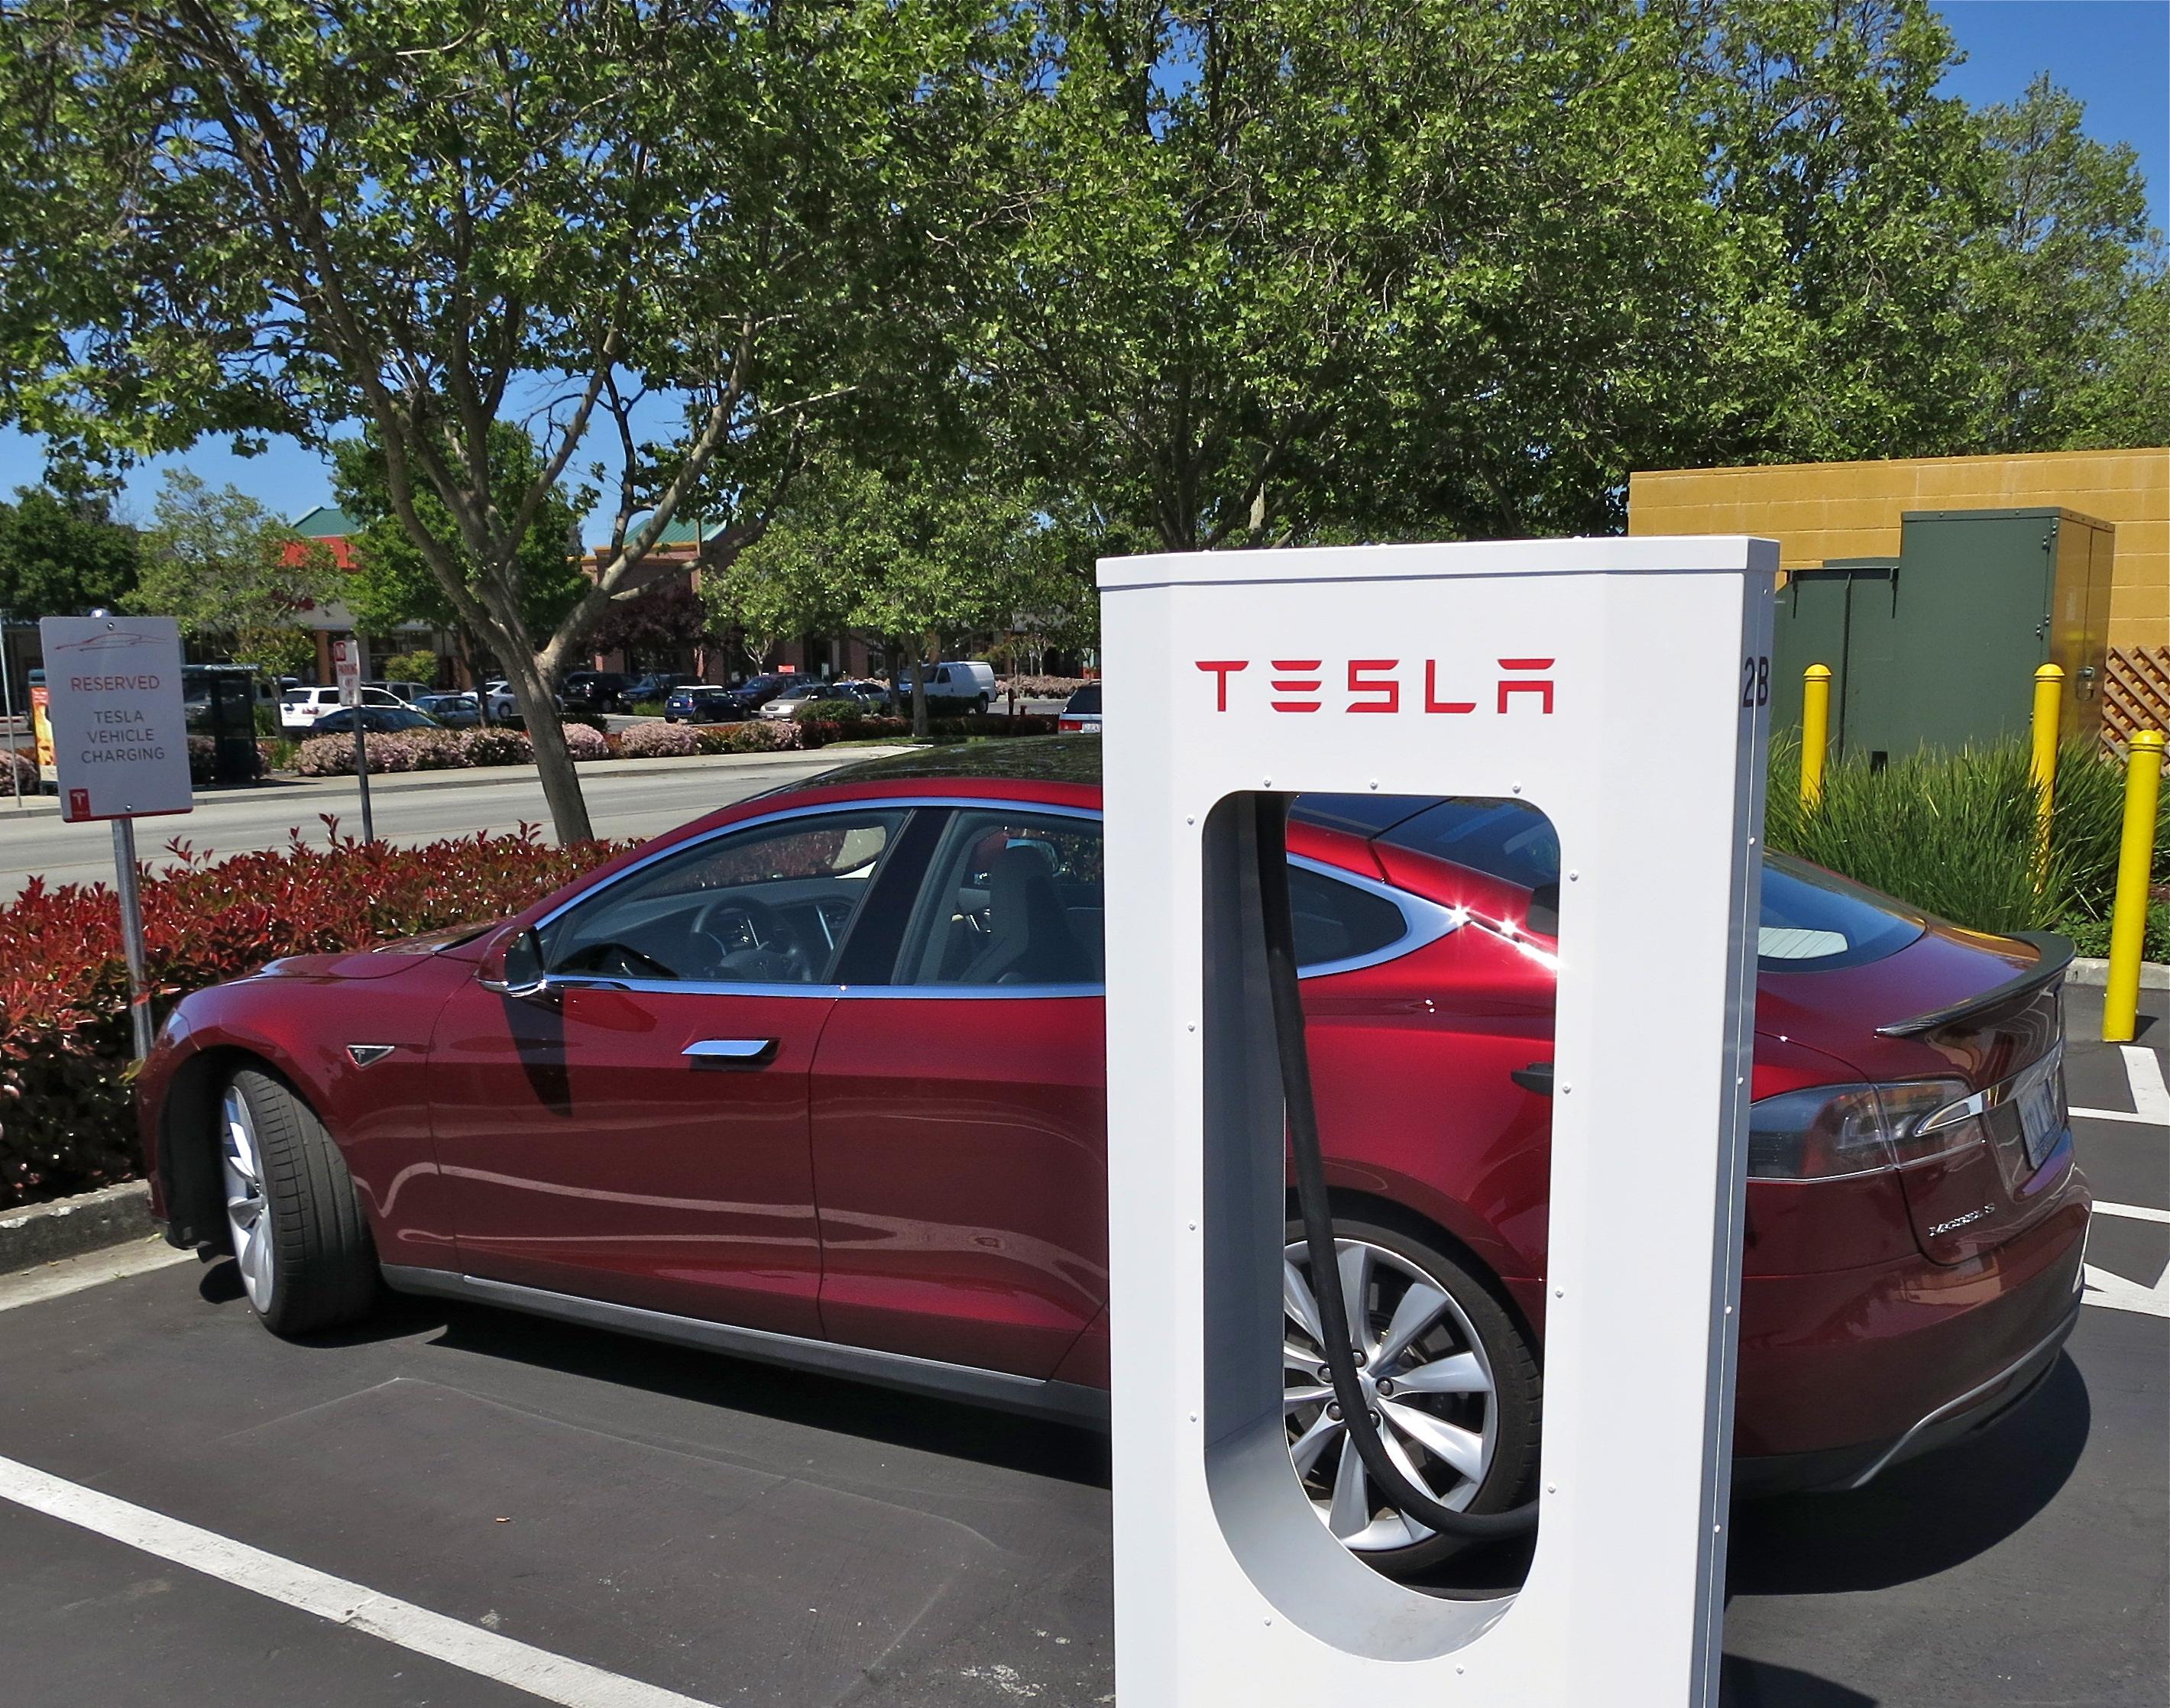 Tesla (NASDAQ: TSLA) Getting Aggressive on Charging Stations